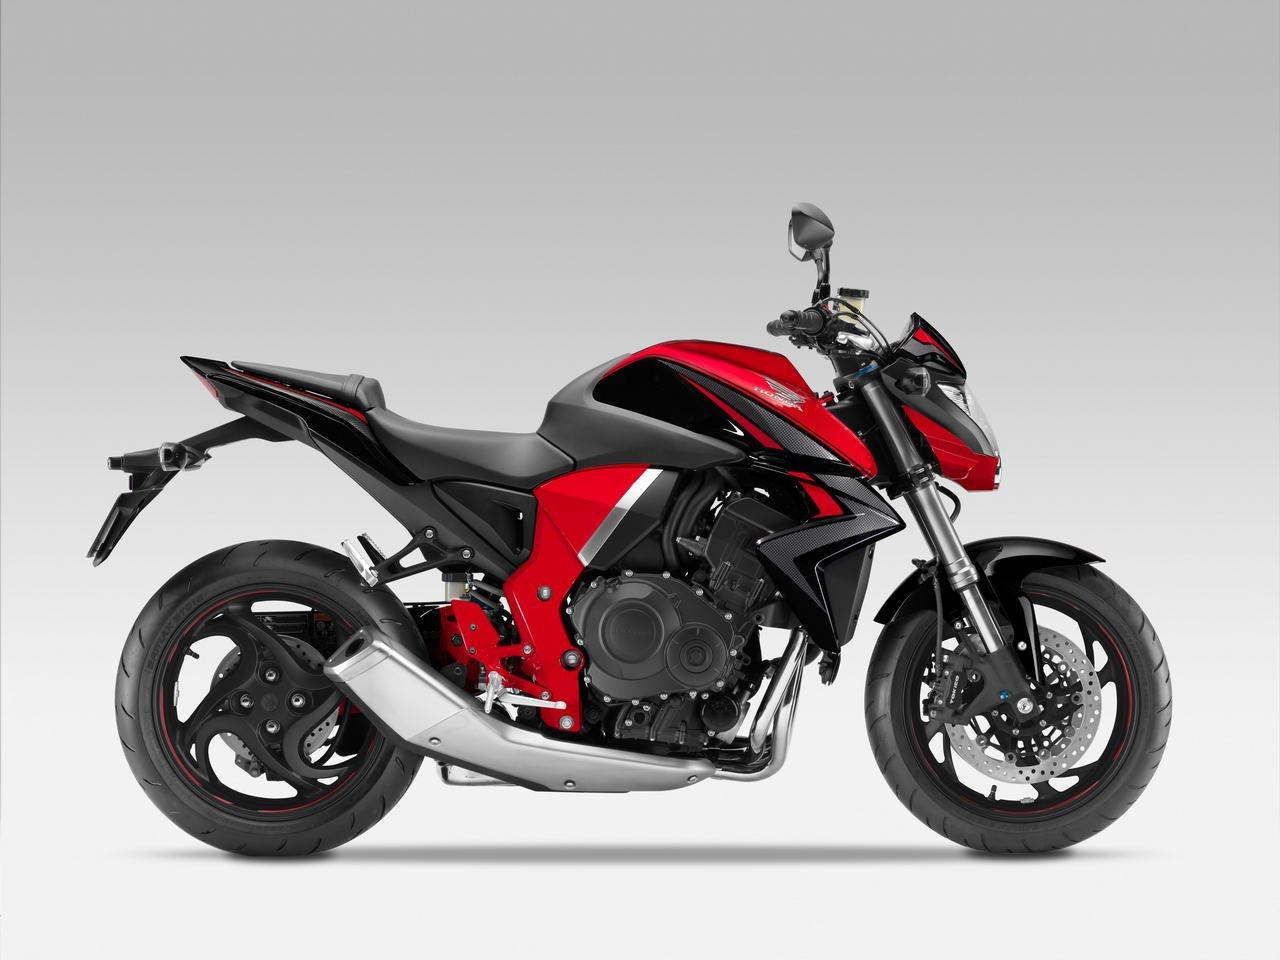 Listino Honda CB 650 F Naked Media - image 14636_1 on http://moto.motori.net